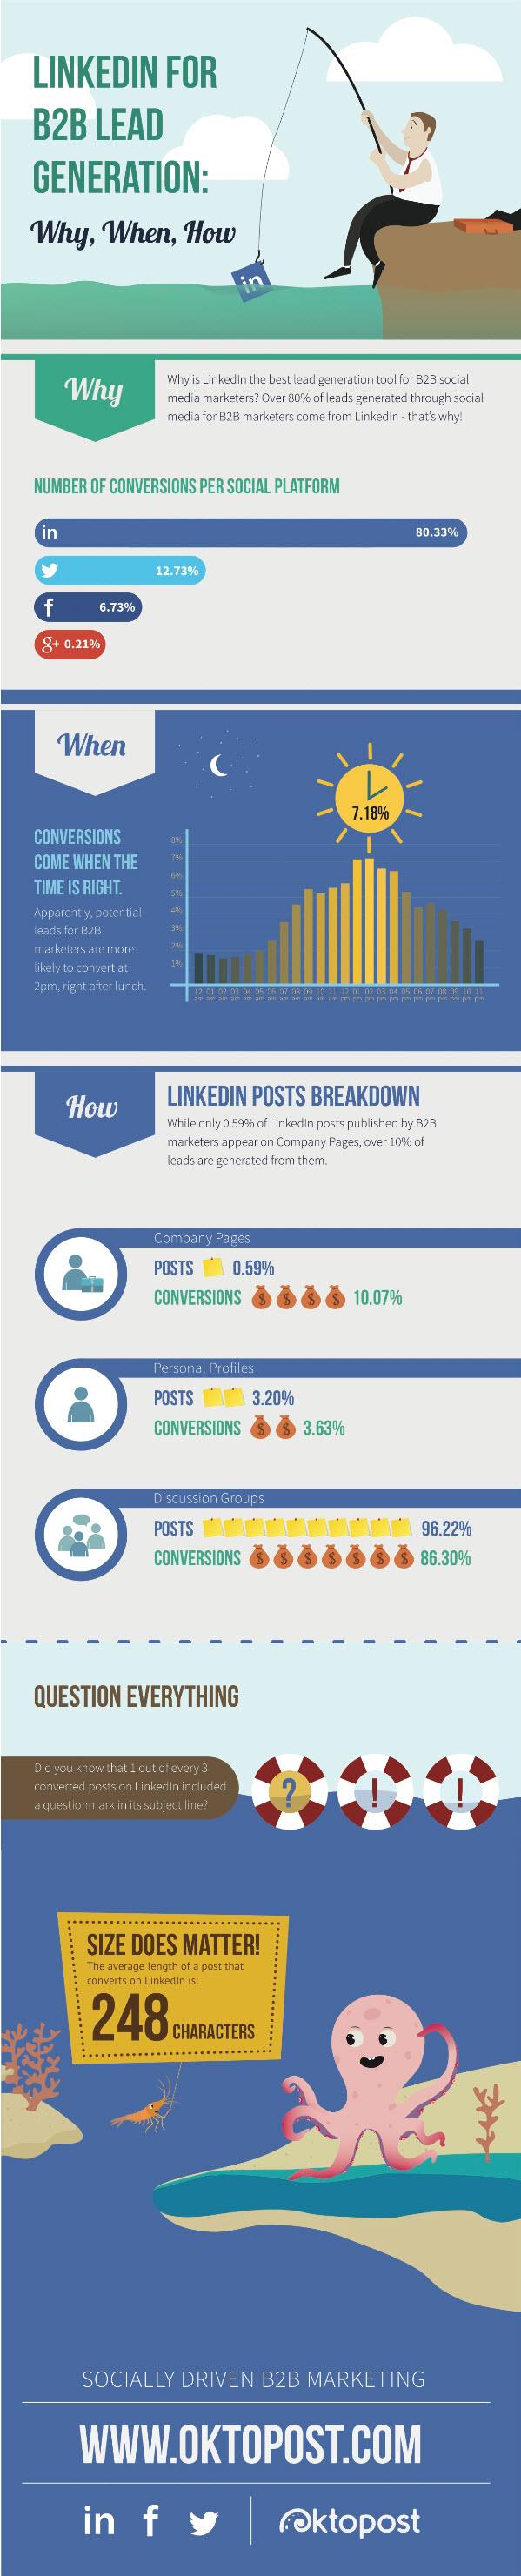 LinkedIN b2b infographic